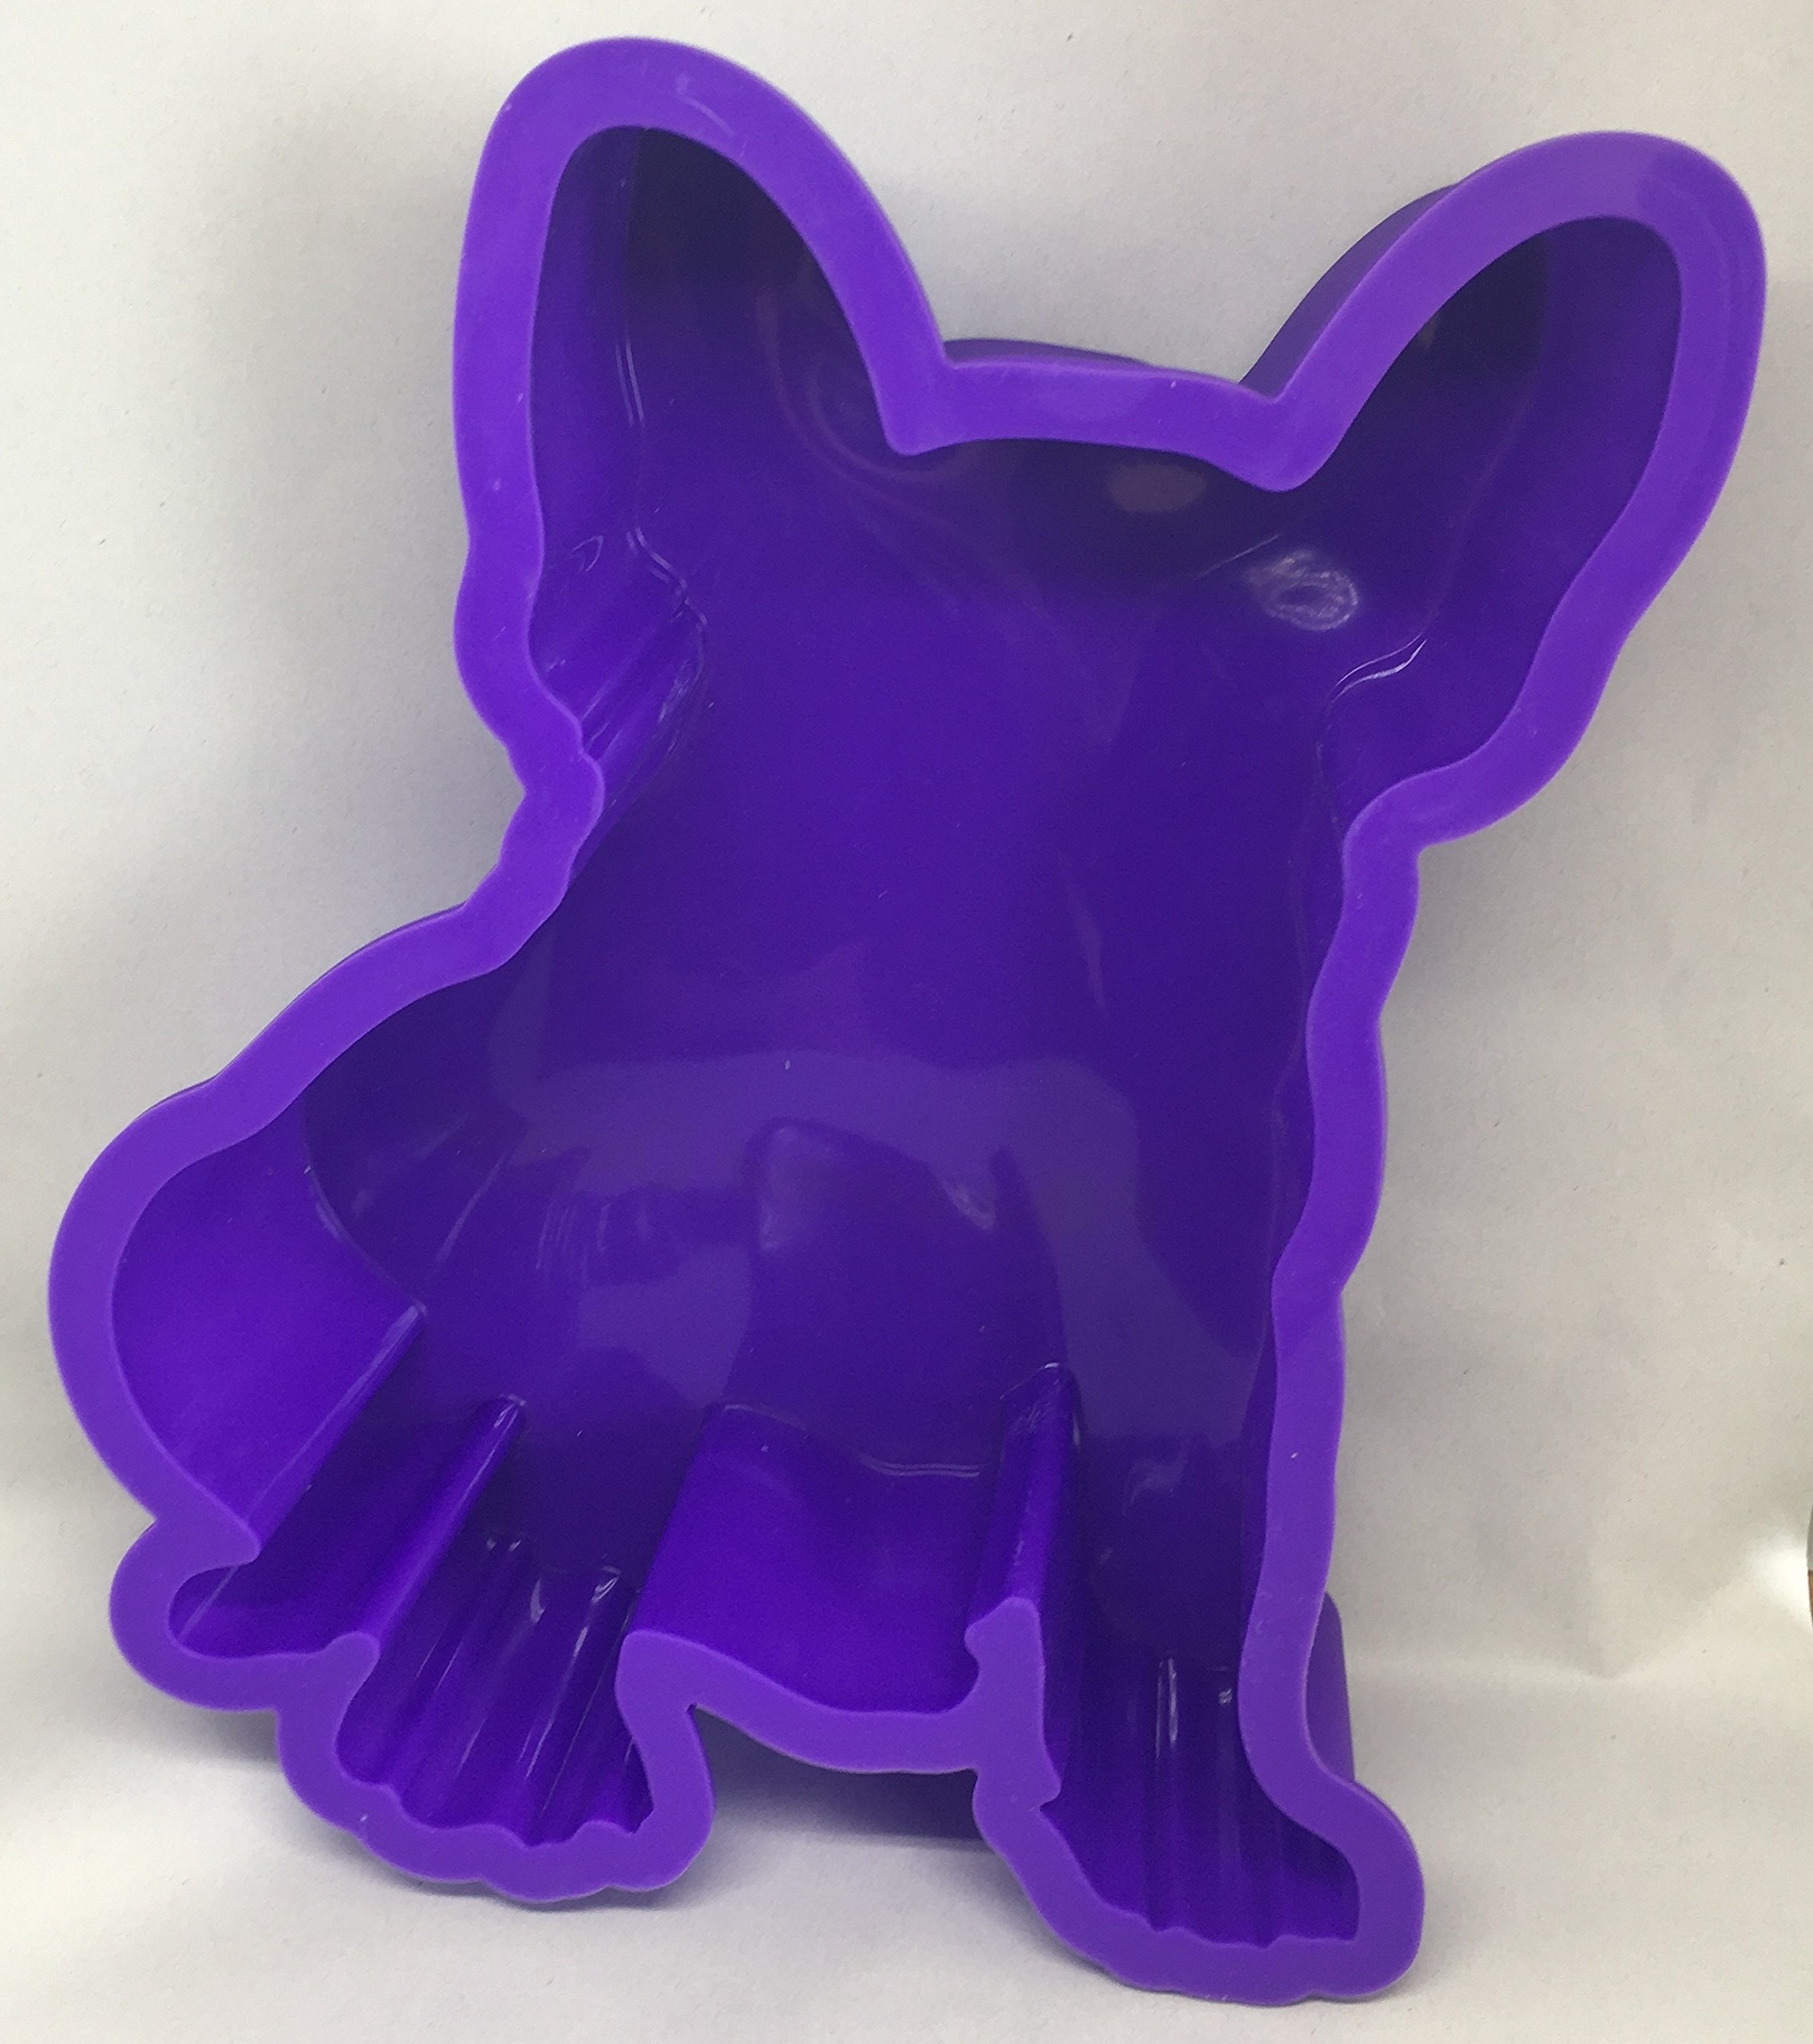 French Bulldog Boston Terrier Dog Birthday Cake Pan Silicone Purple Large